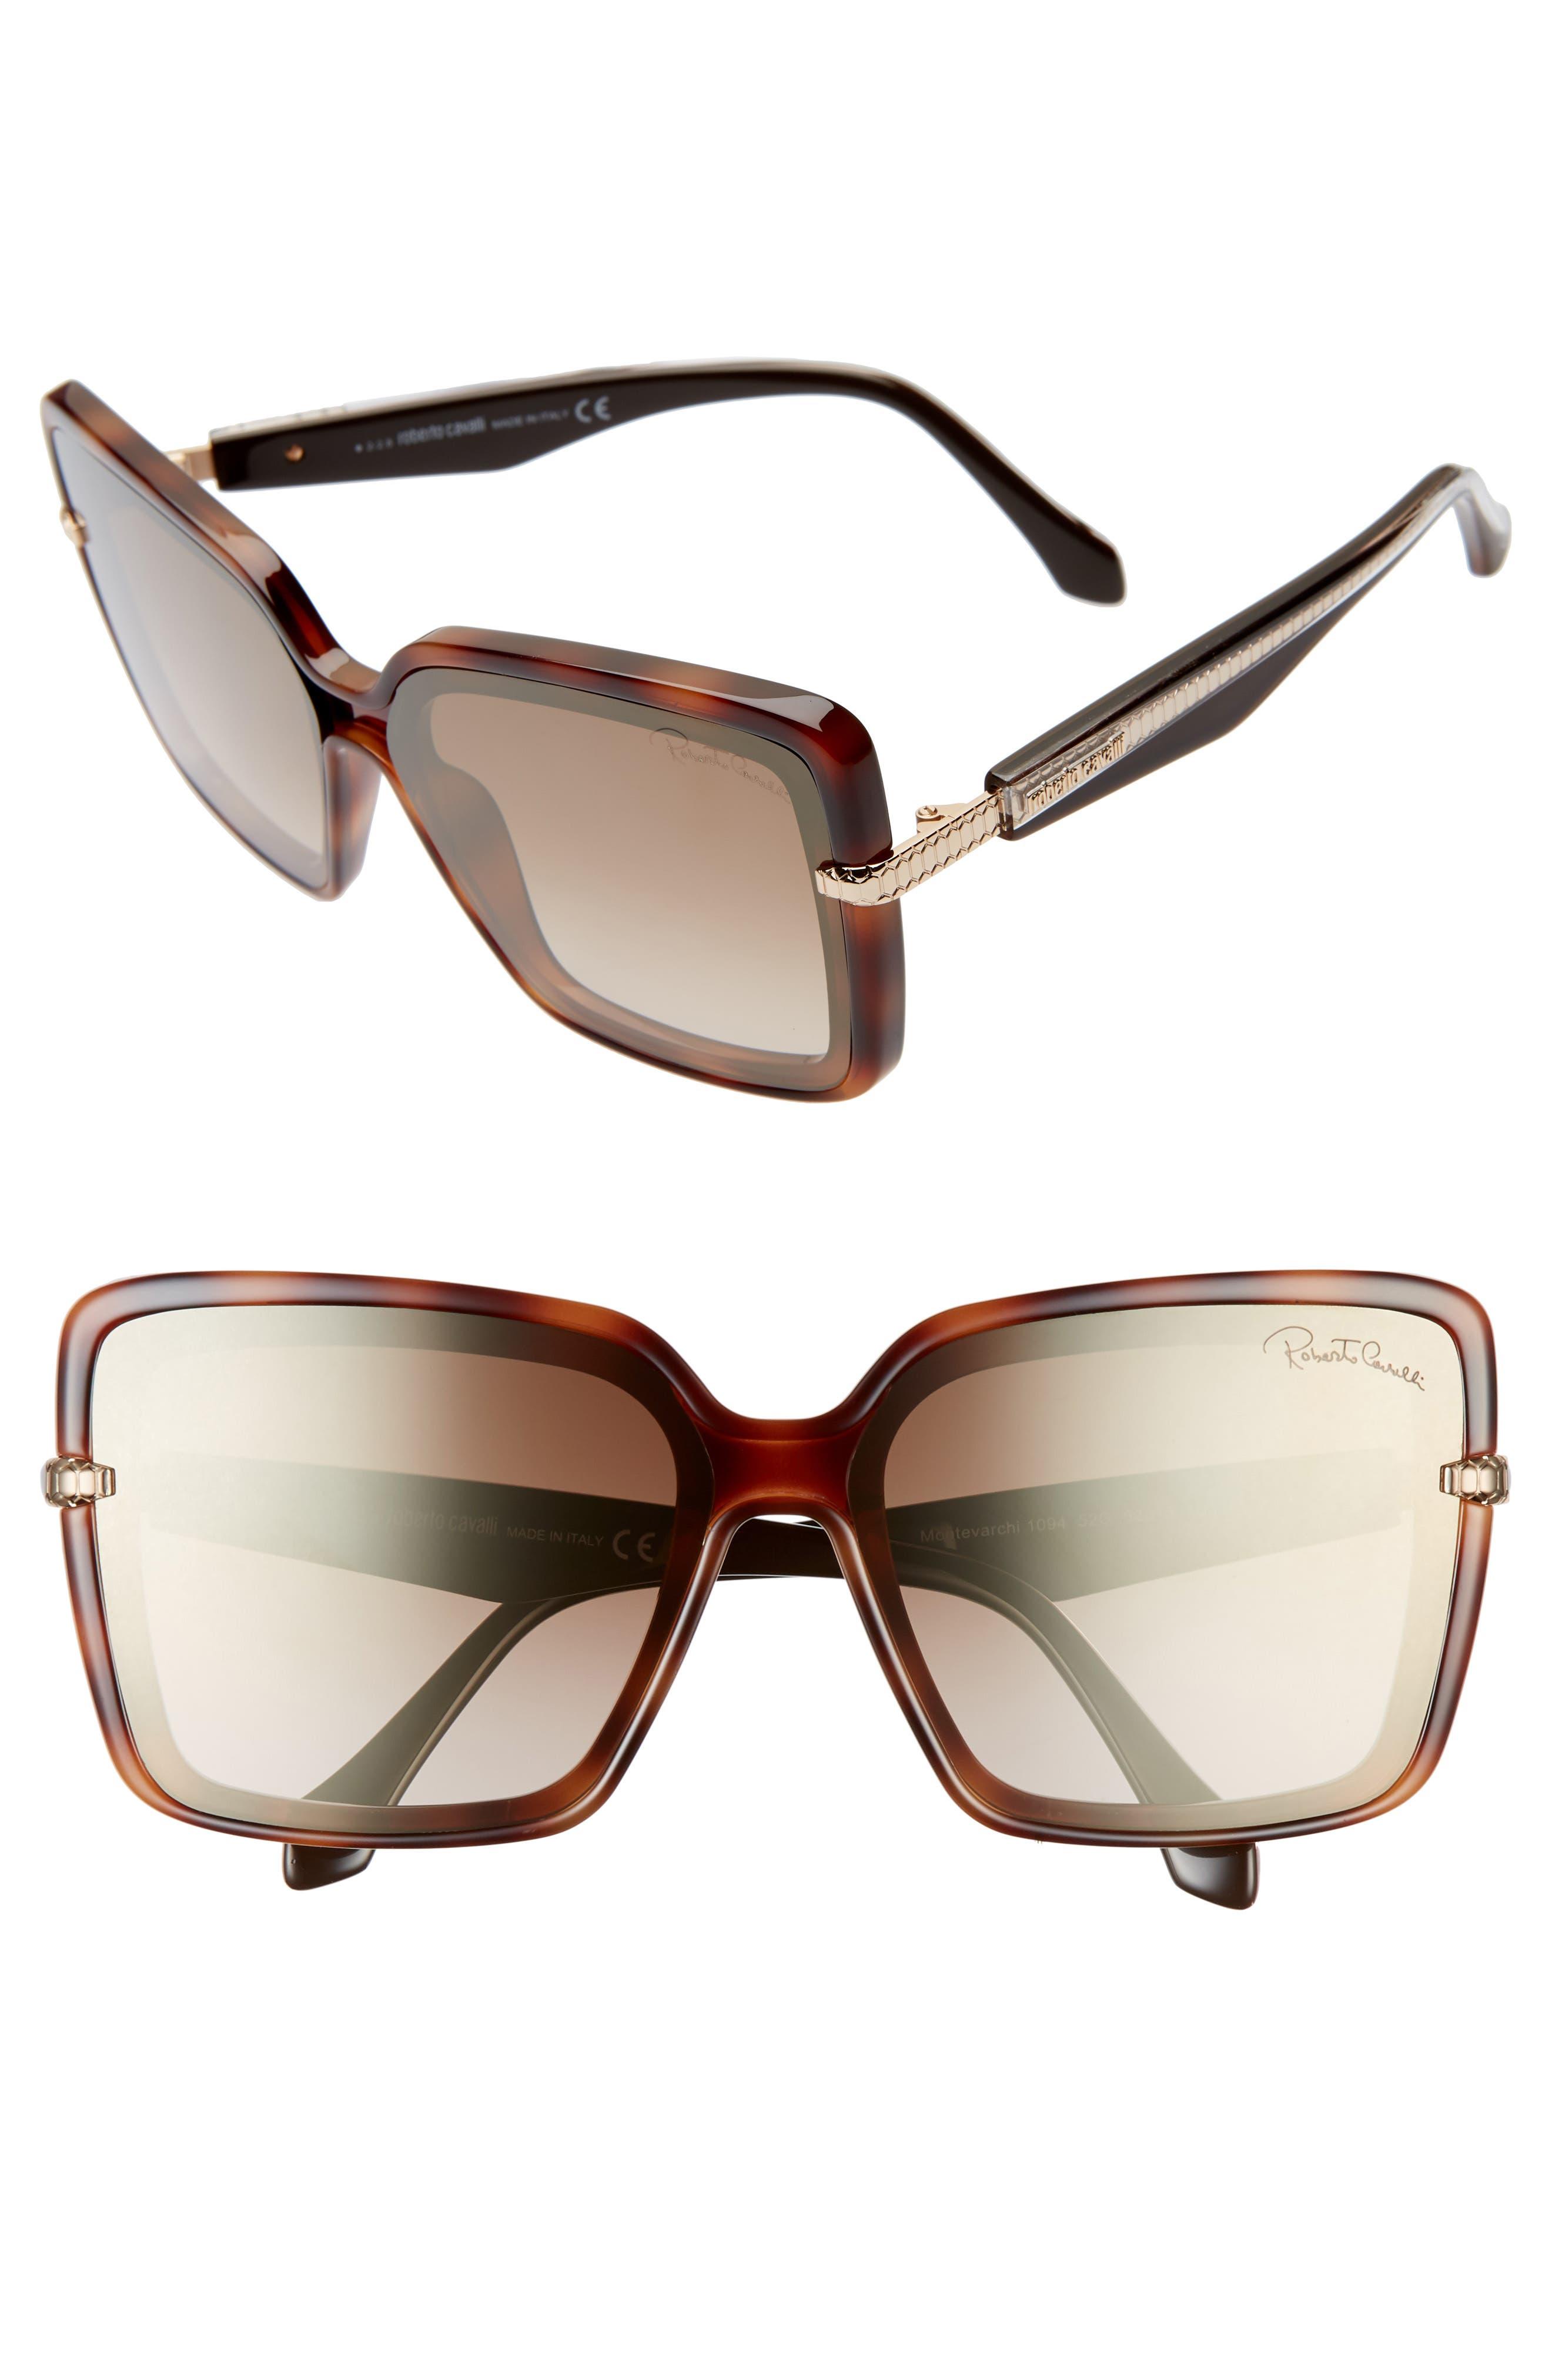 Roberto Cavalli 62Mm Oversize Flat Front Butterfly Sunglasses - Dark Havana/ Brown Mirror